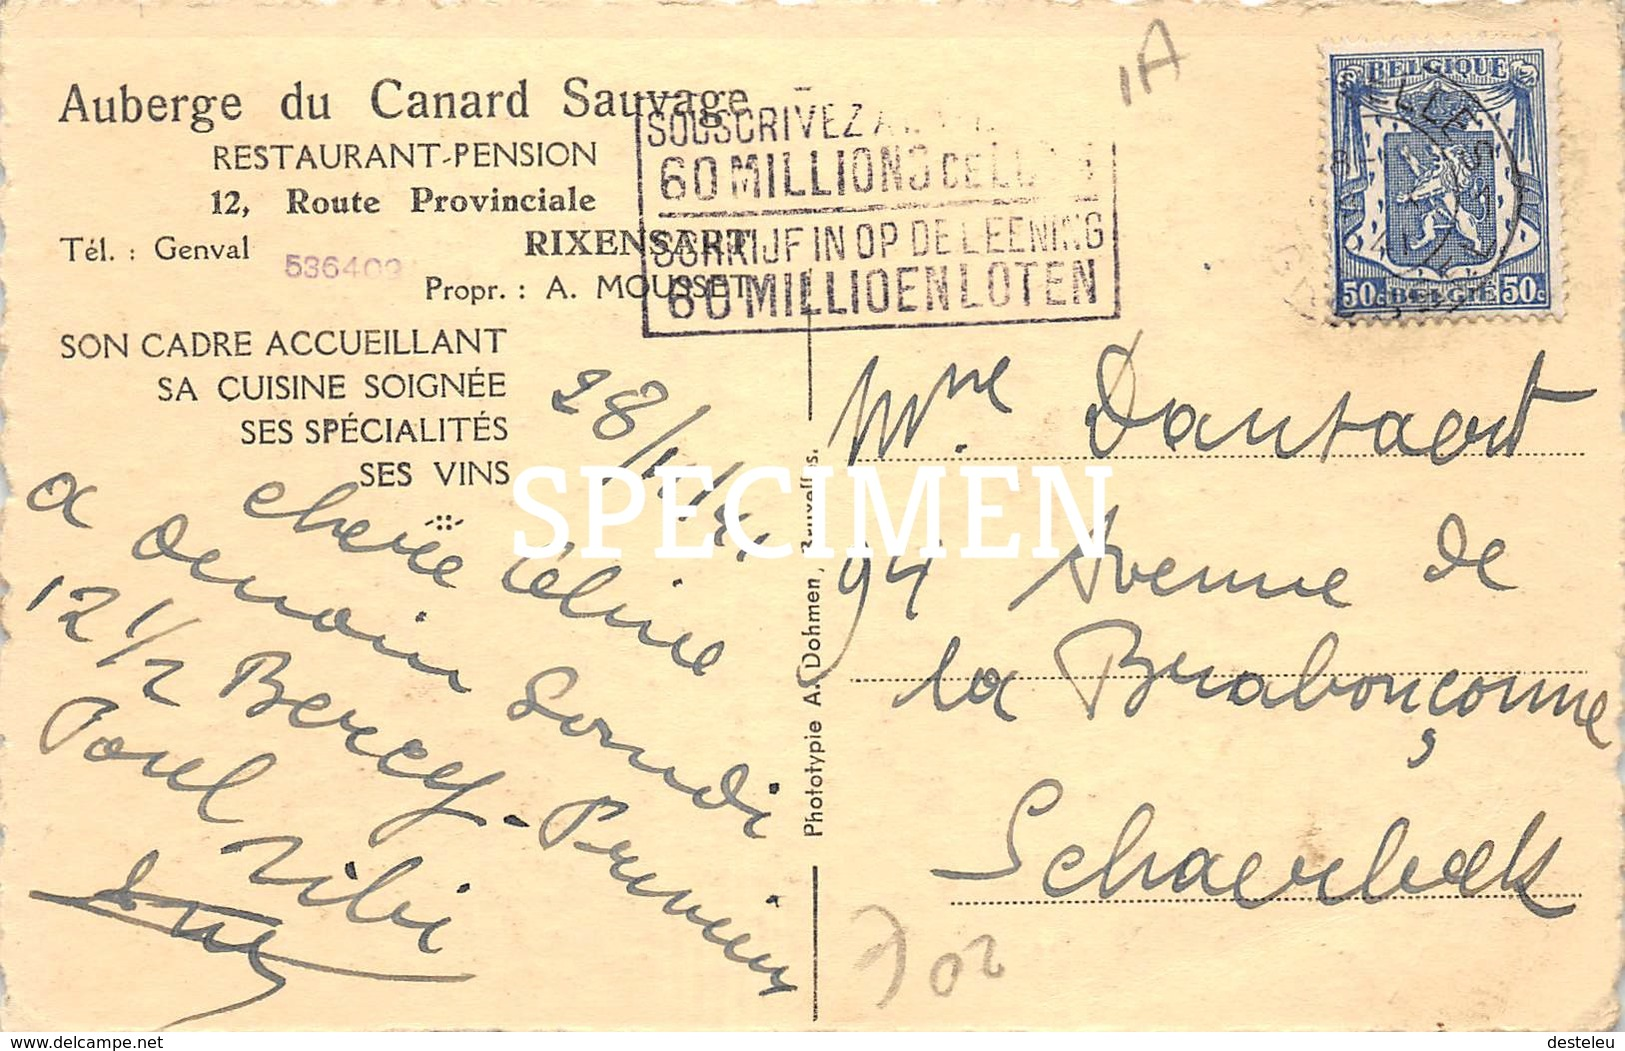 Auberge Du Canard Sauvage - Rixensart - Rixensart